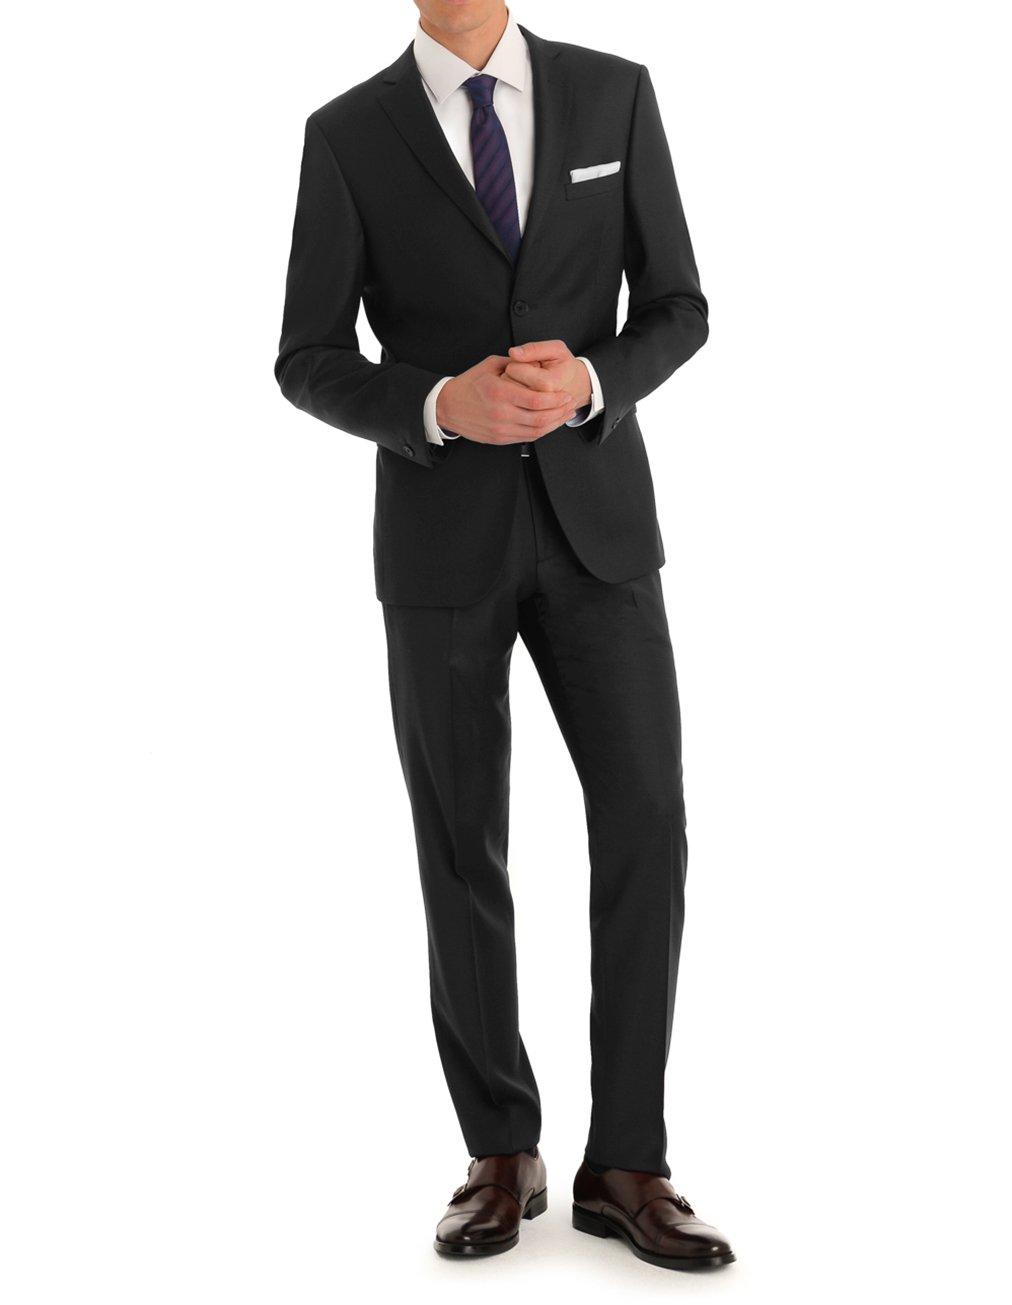 MDRN Uomo Men's Slim Fit 2 Piece Suit, Black, 46R/40W